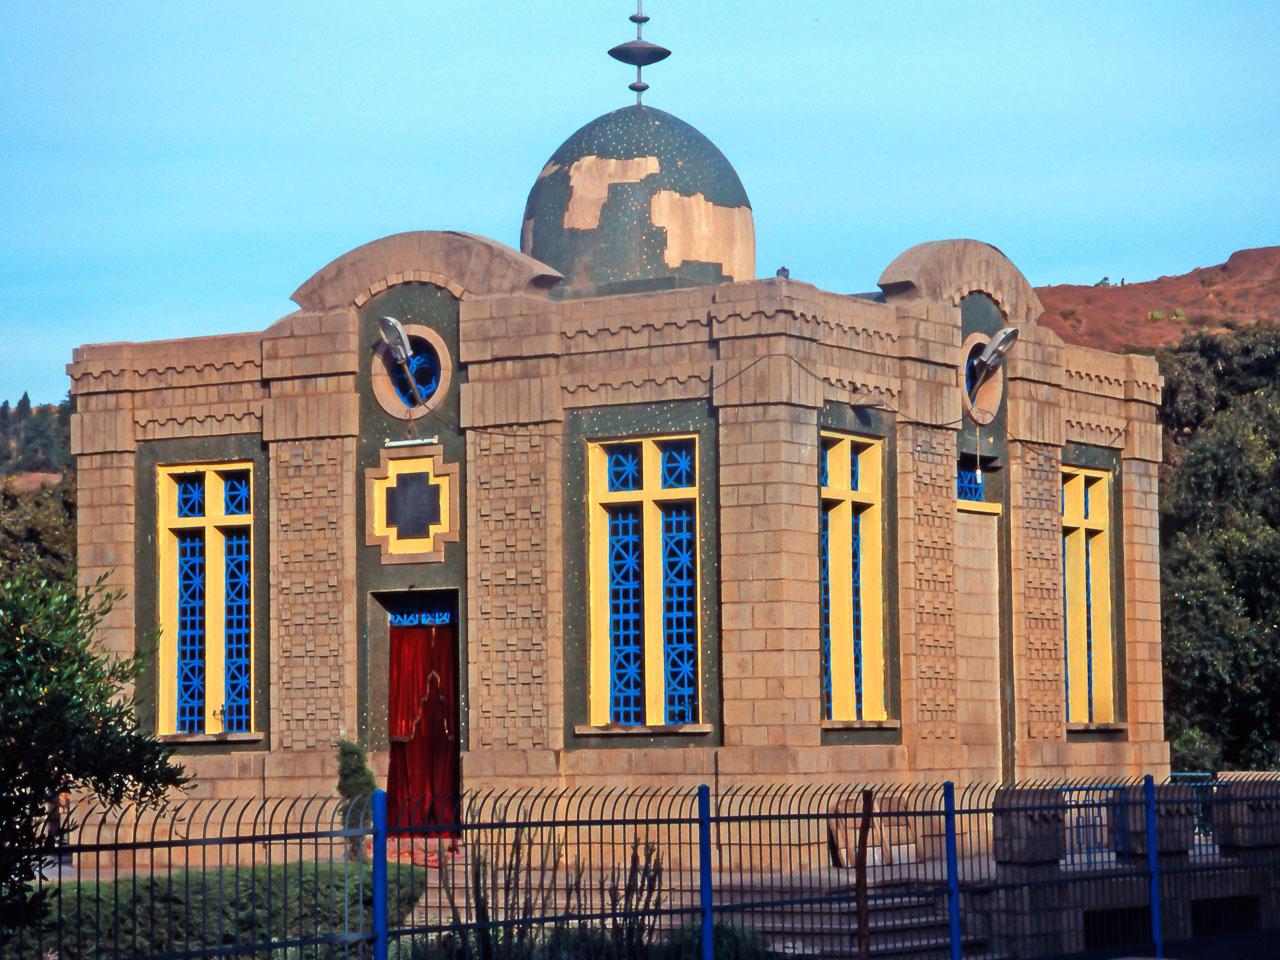 ET05068-House-of-the-ark-of-covenant-in-Axum.jpg